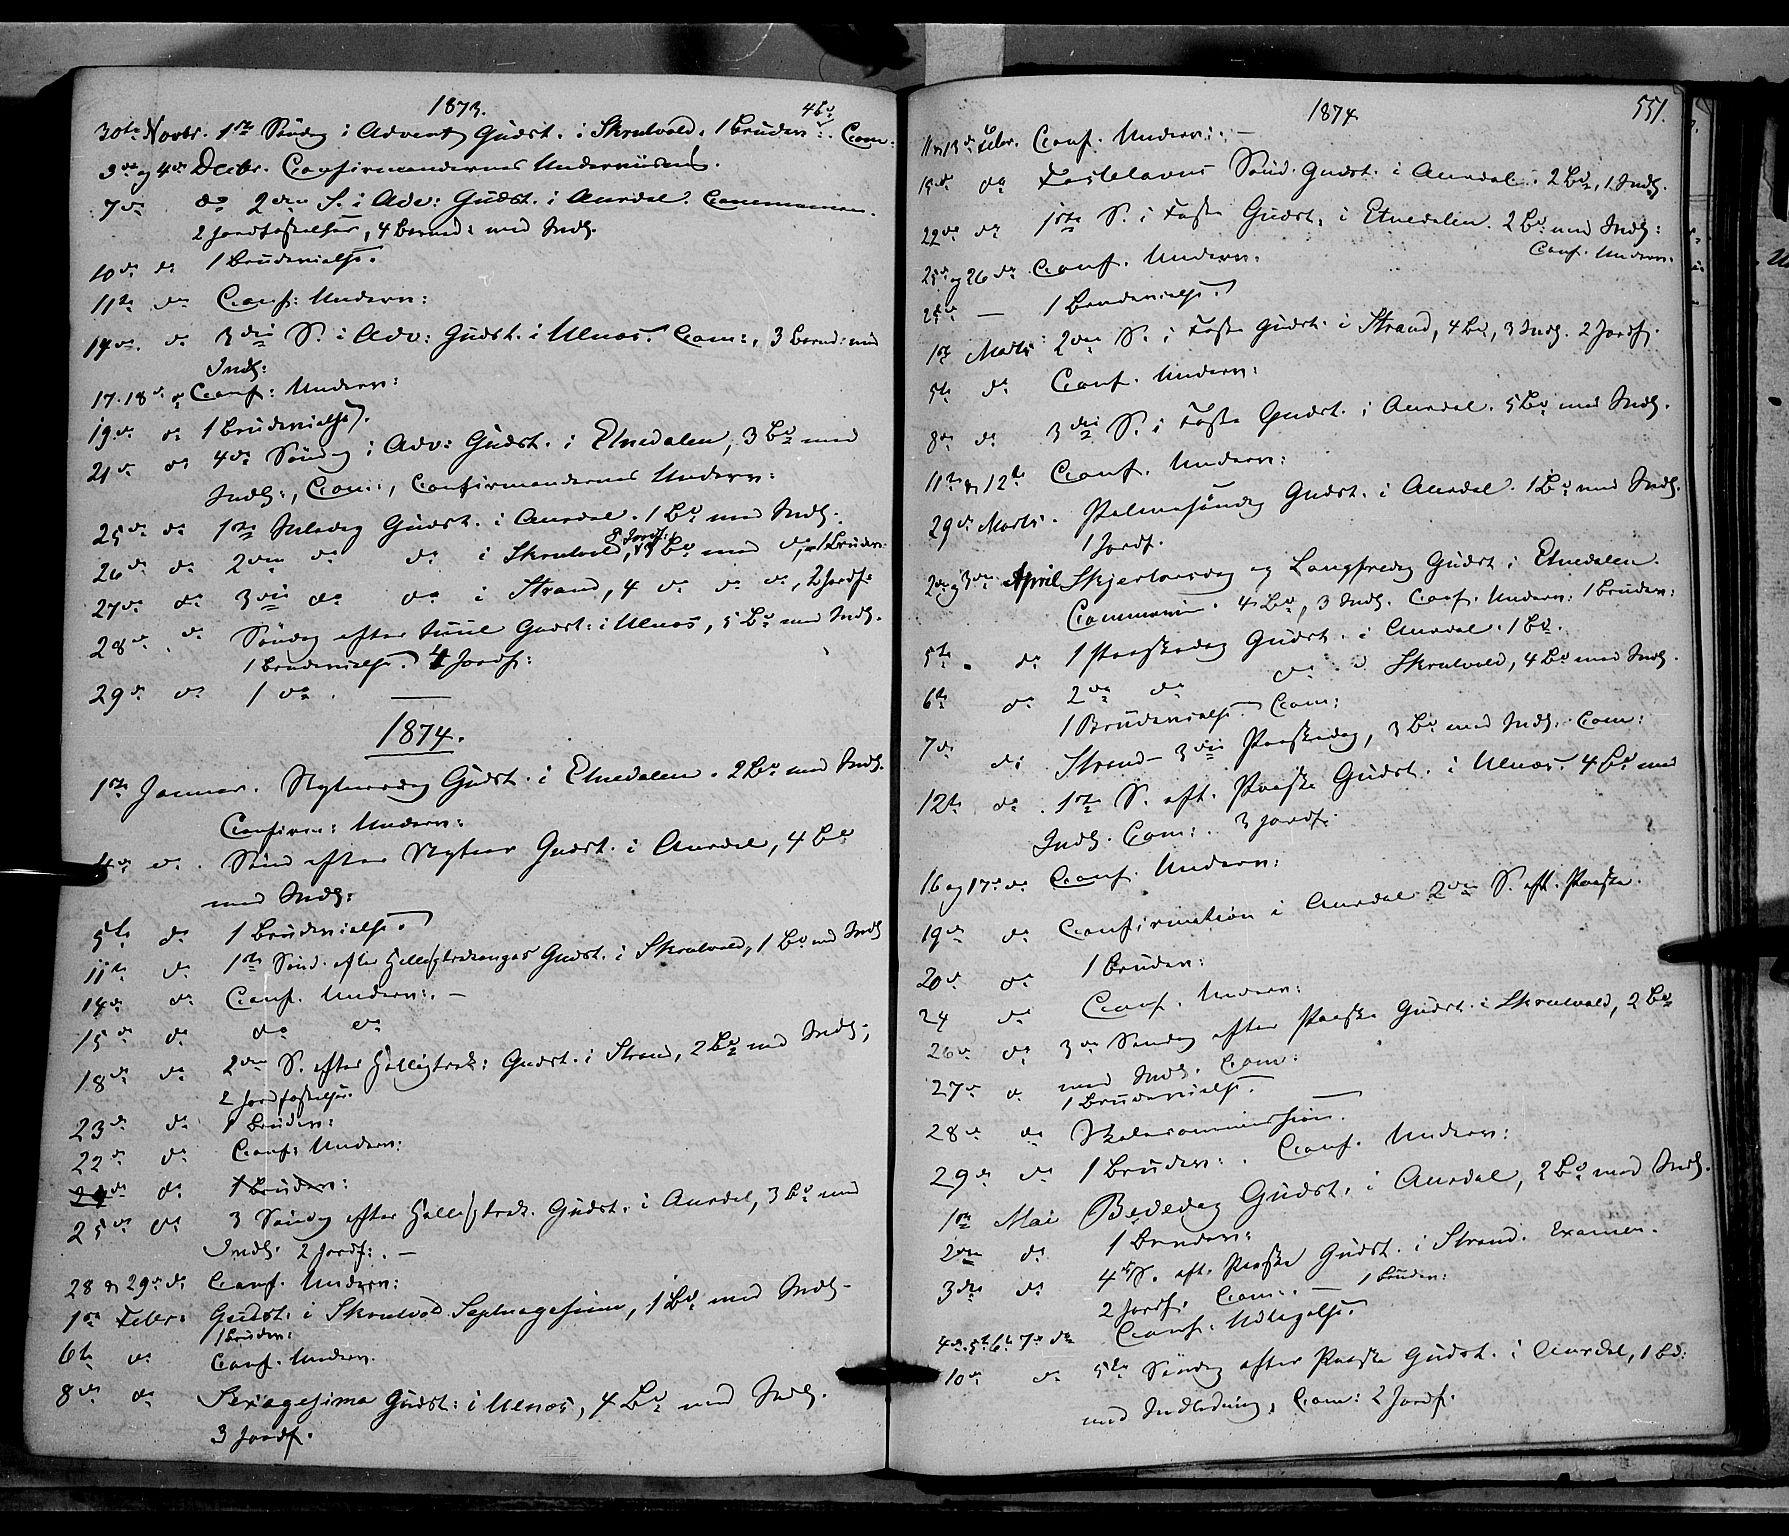 SAH, Nord-Aurdal prestekontor, Ministerialbok nr. 8, 1863-1875, s. 551